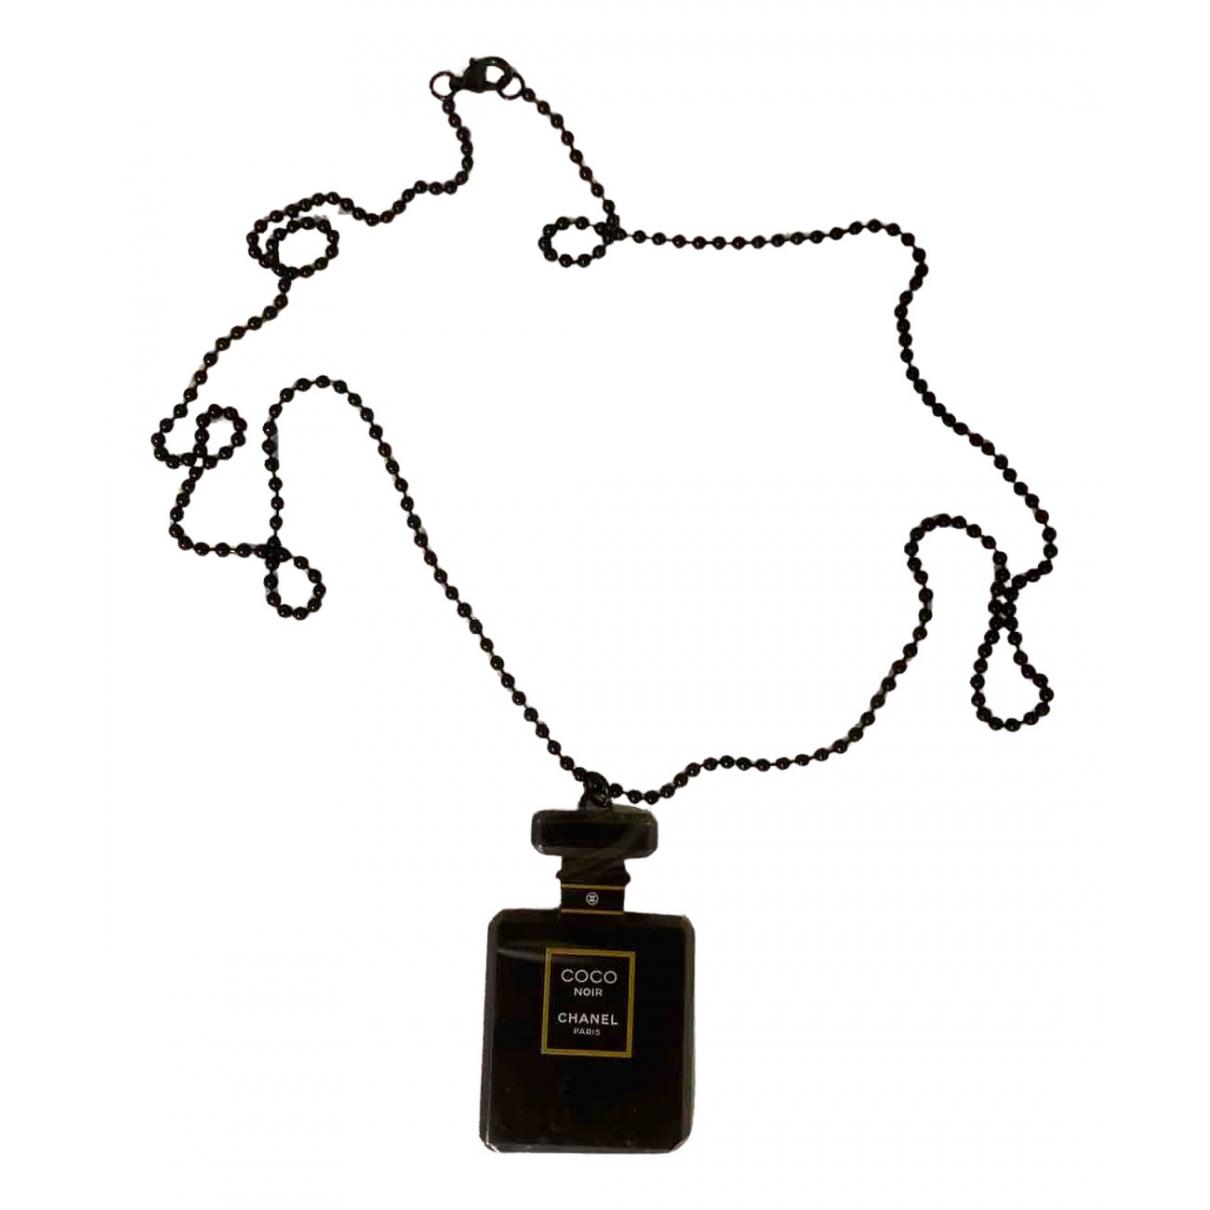 Chanel \N Kette in  Schwarz Metall